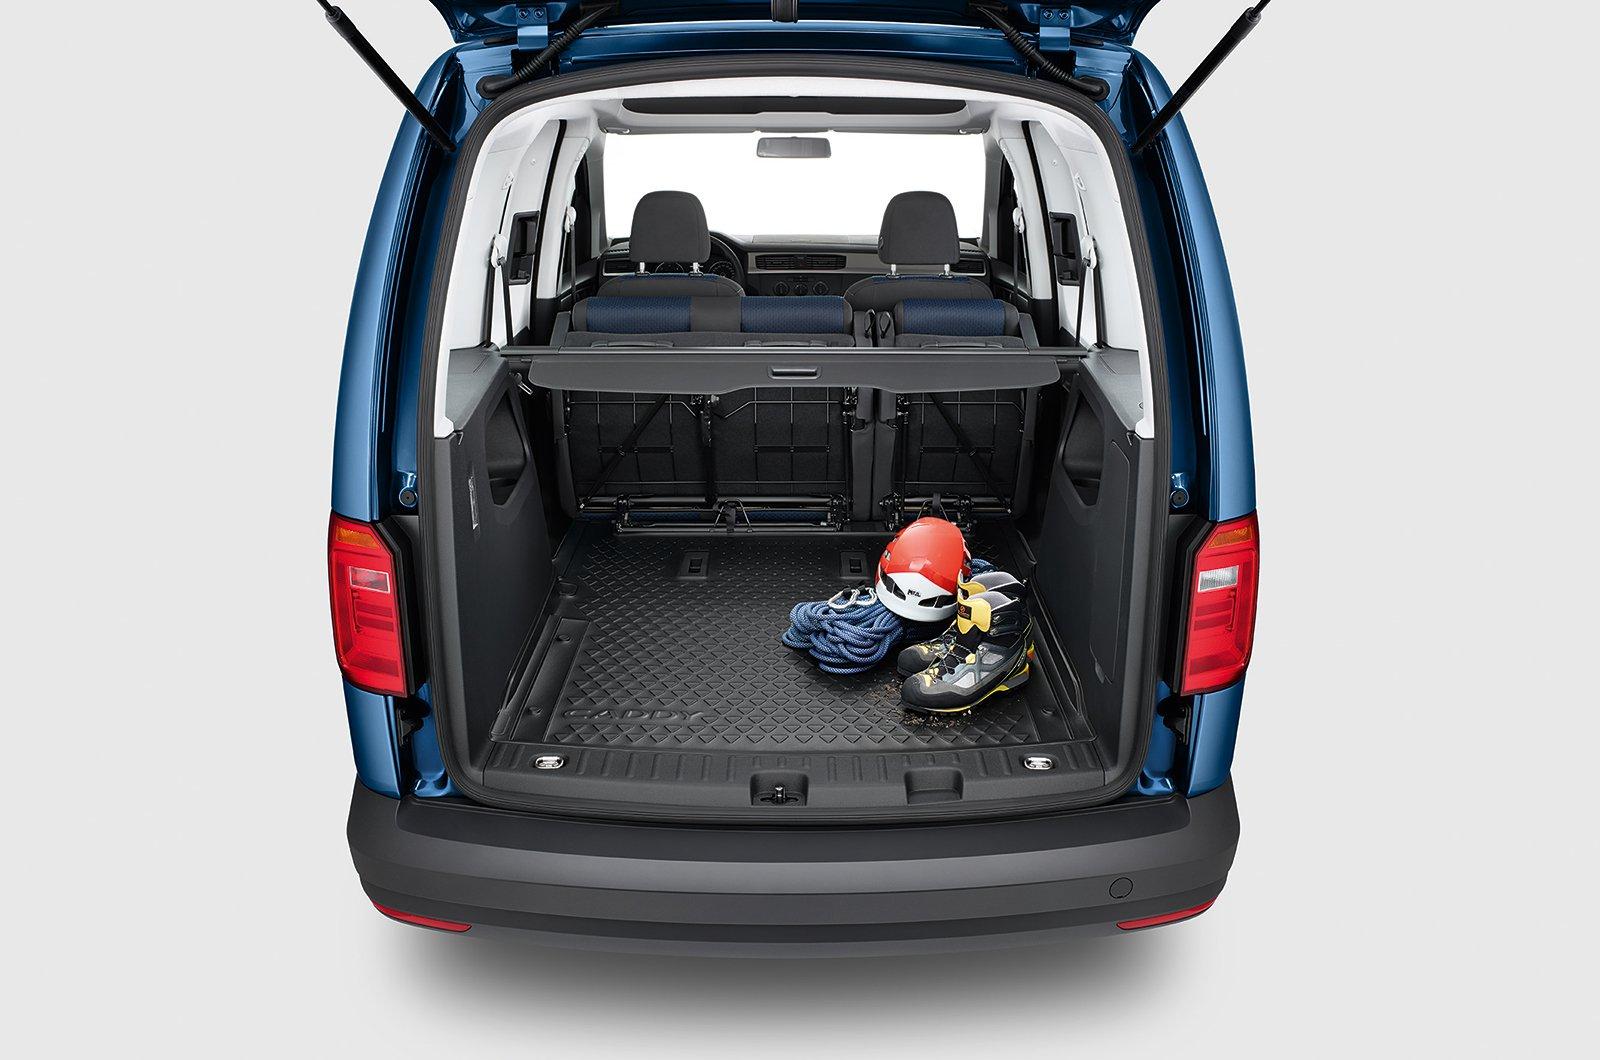 Volkswagen Caddy rear